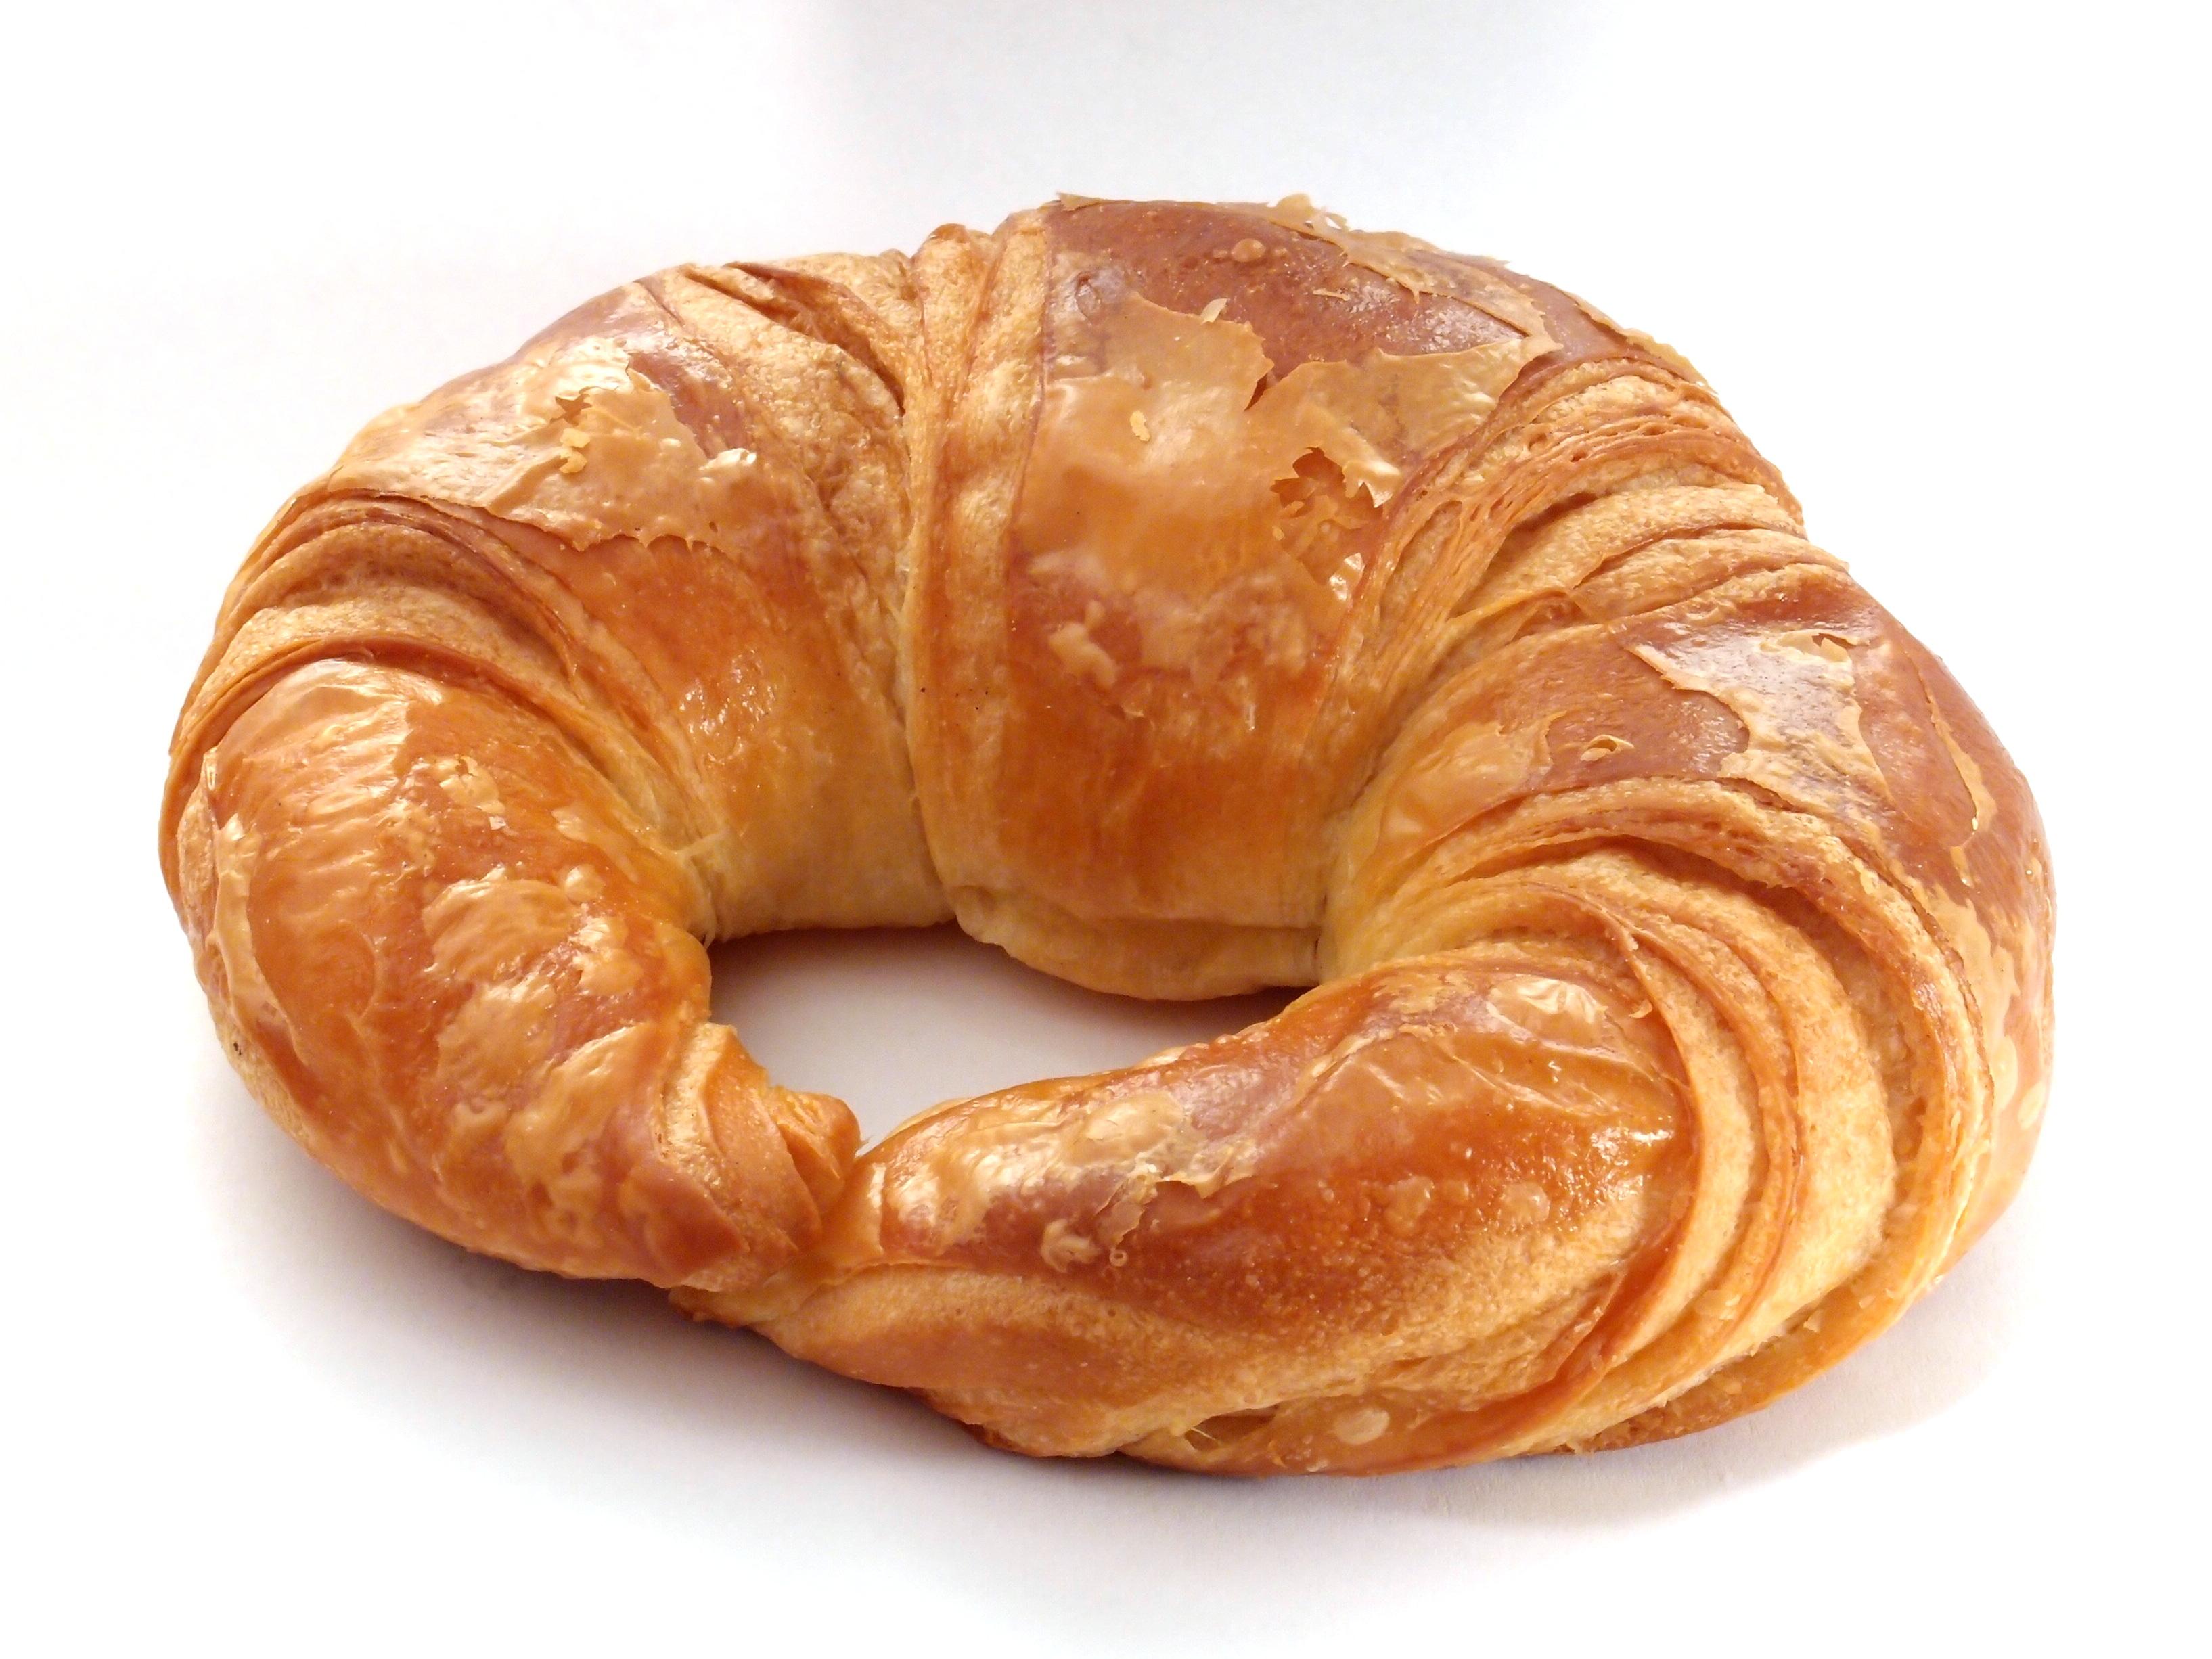 Croissant And Hot Dog Recipes